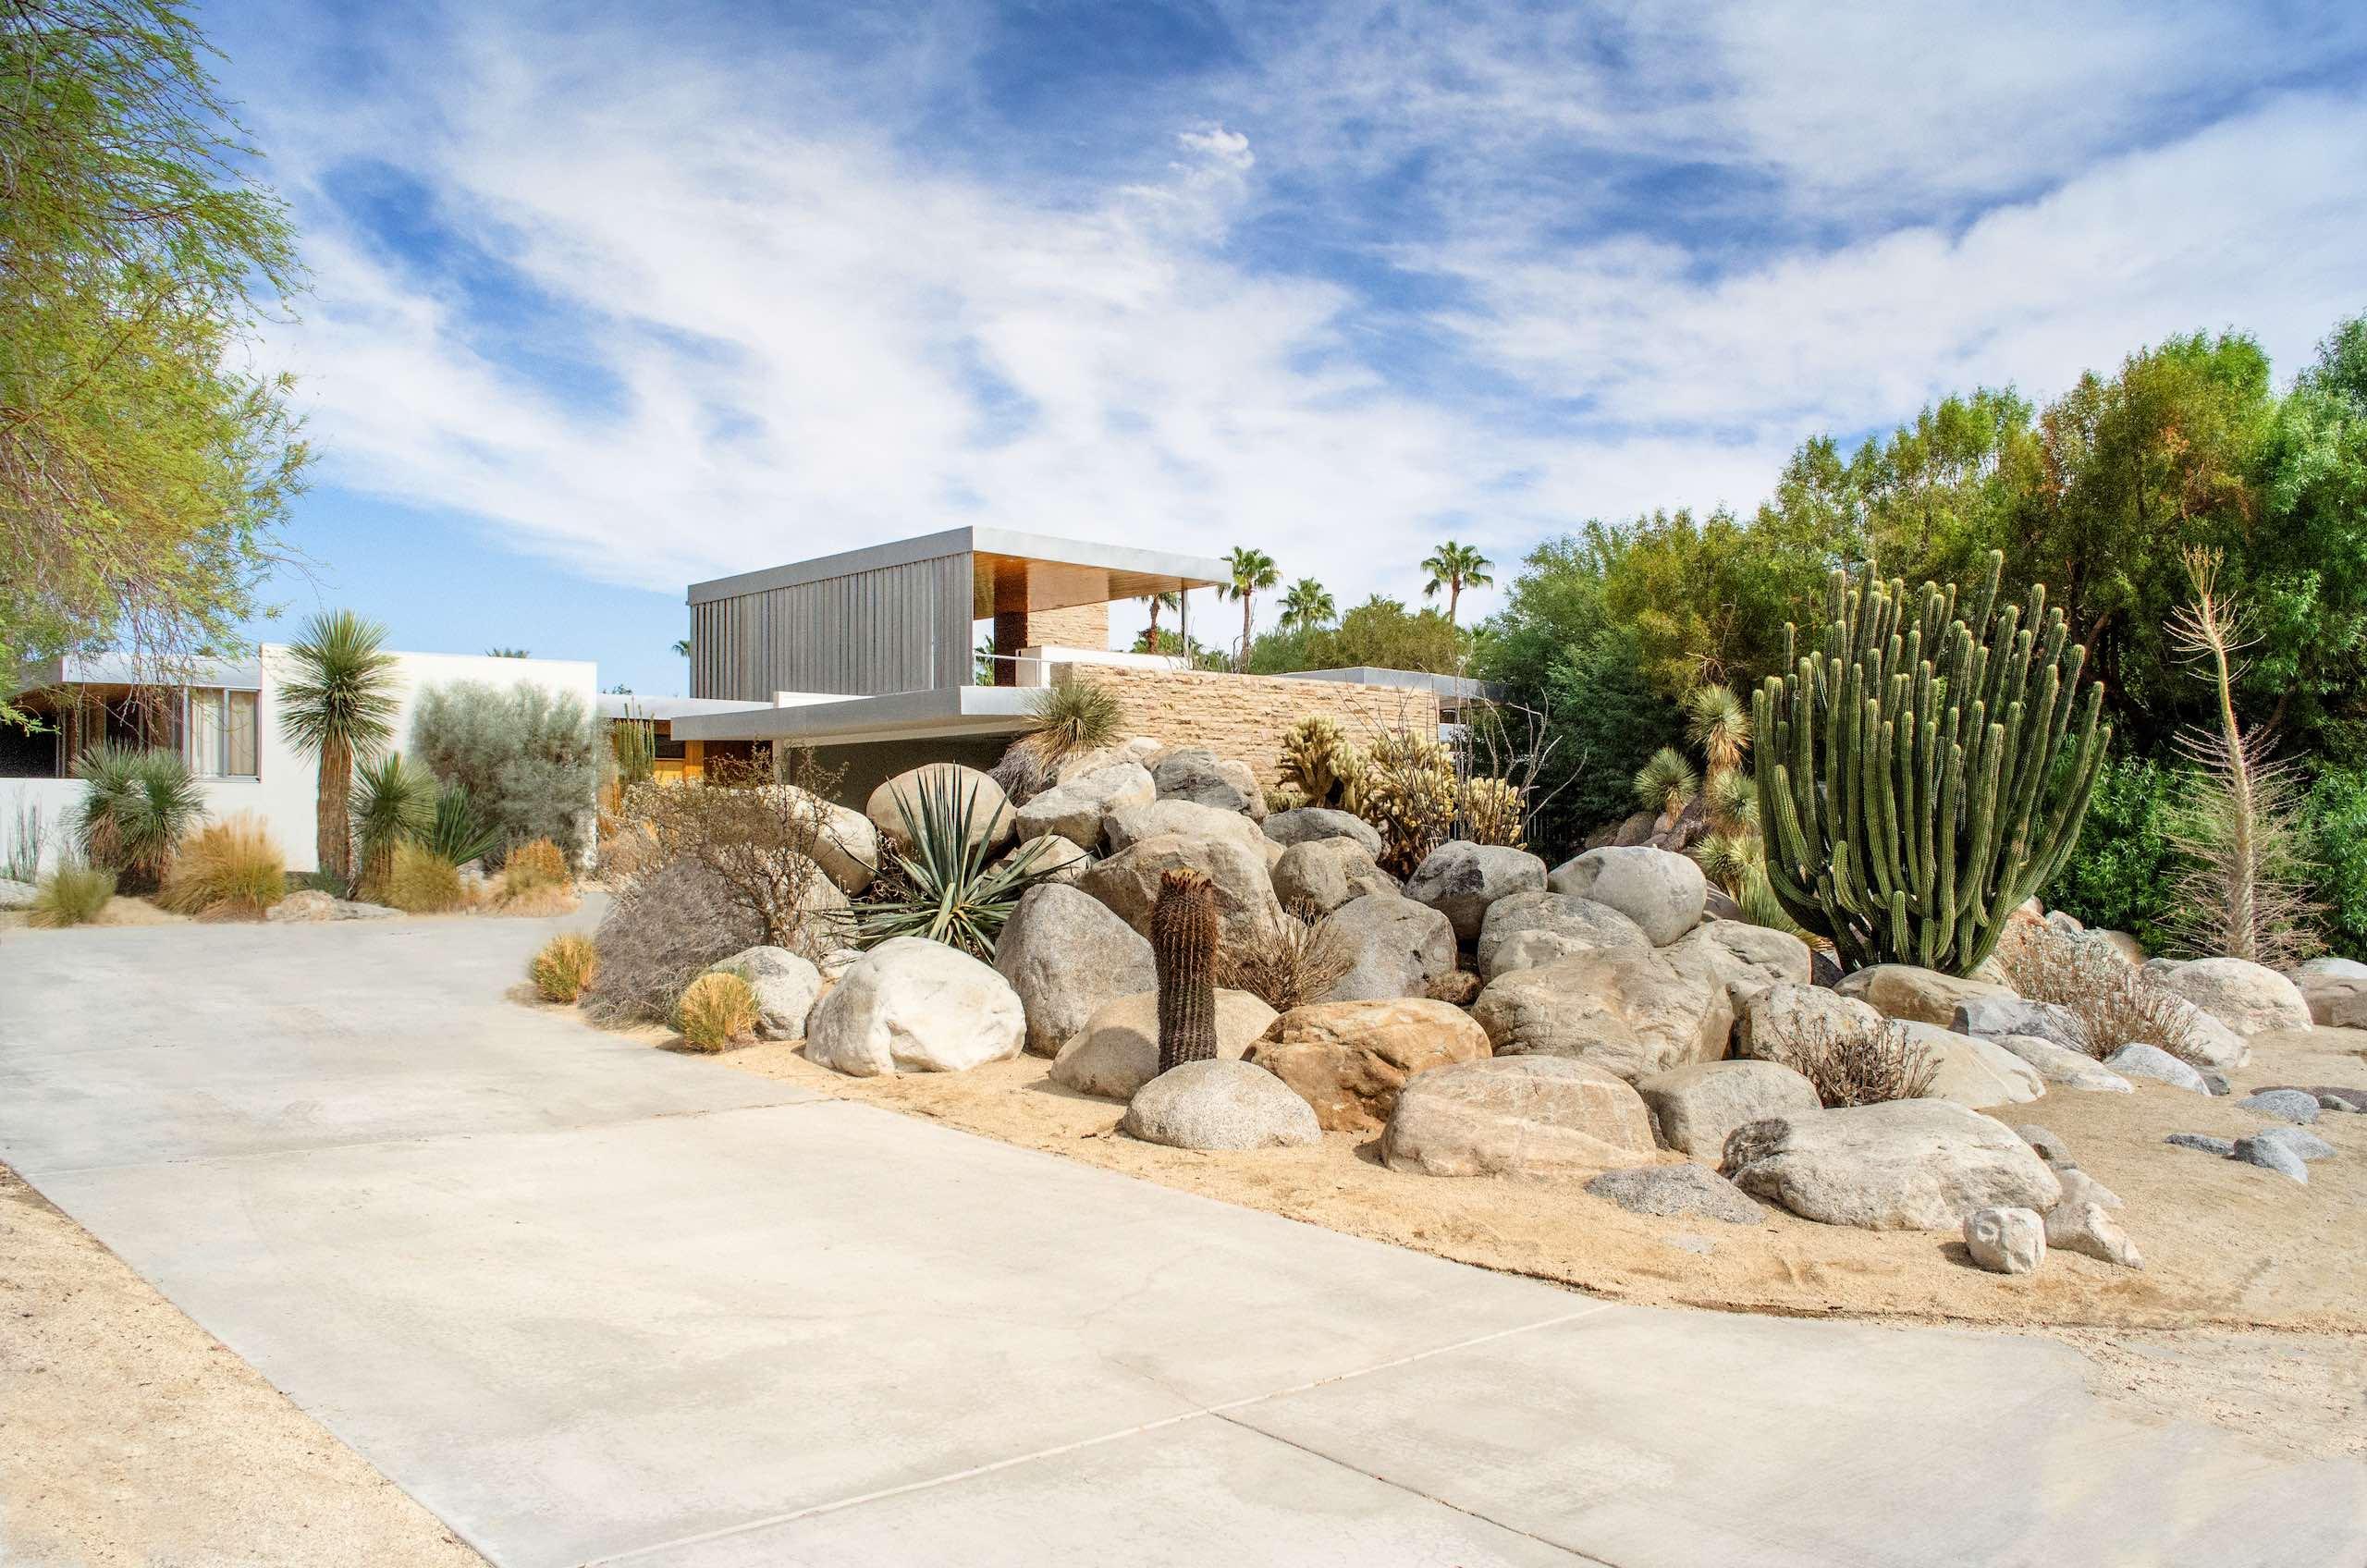 Richard Neutra's Kaufmann Desert House | Photo: David Everett Strickler